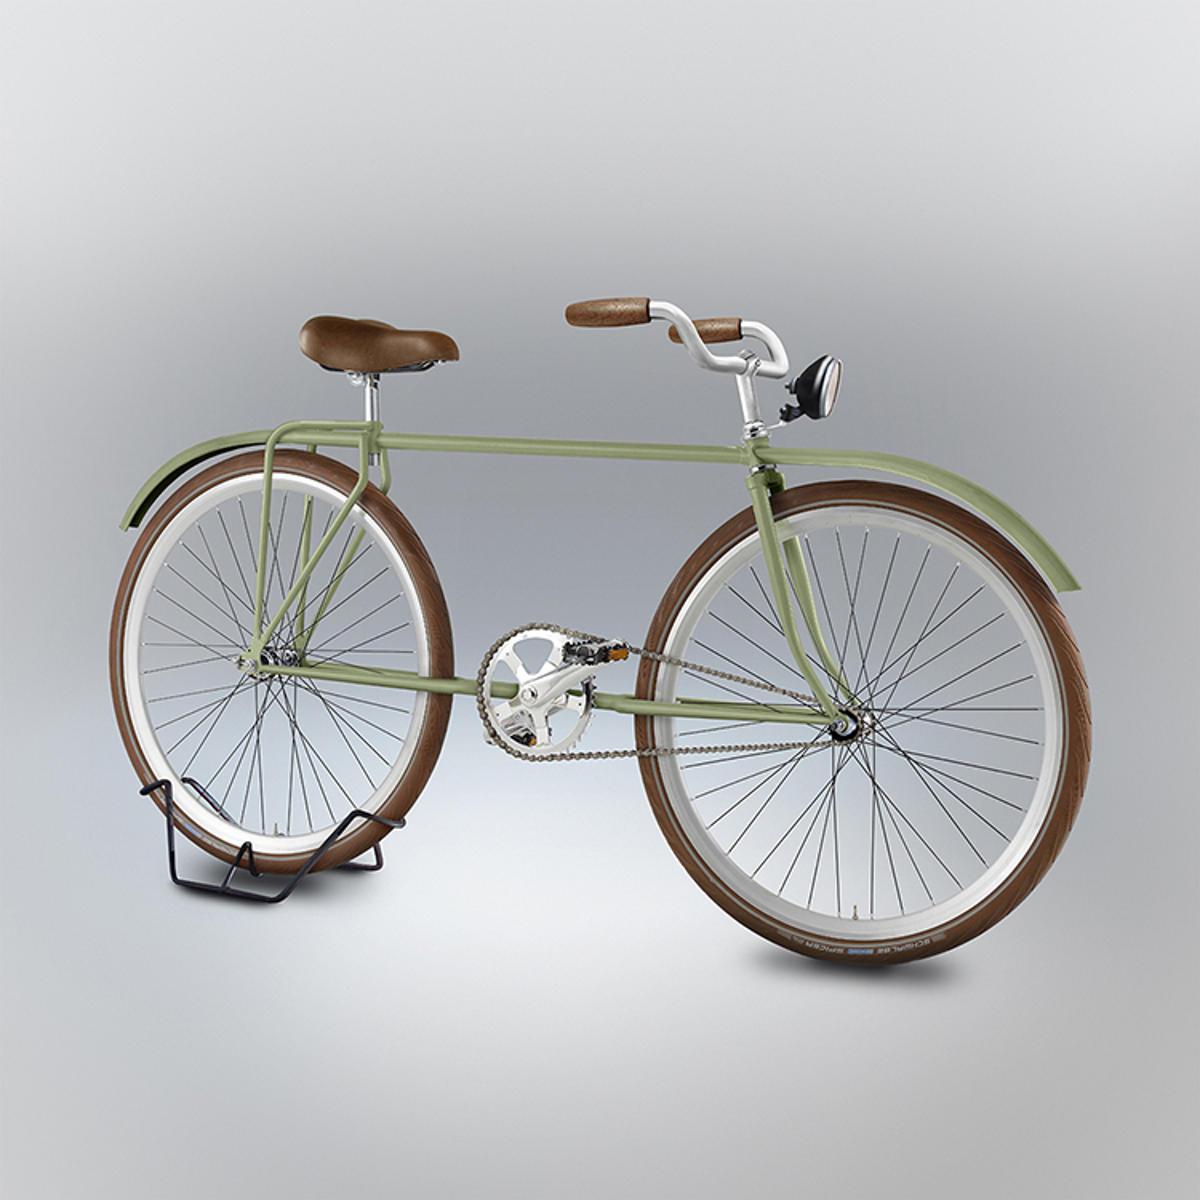 bike desings from memory italian futuristic (14)